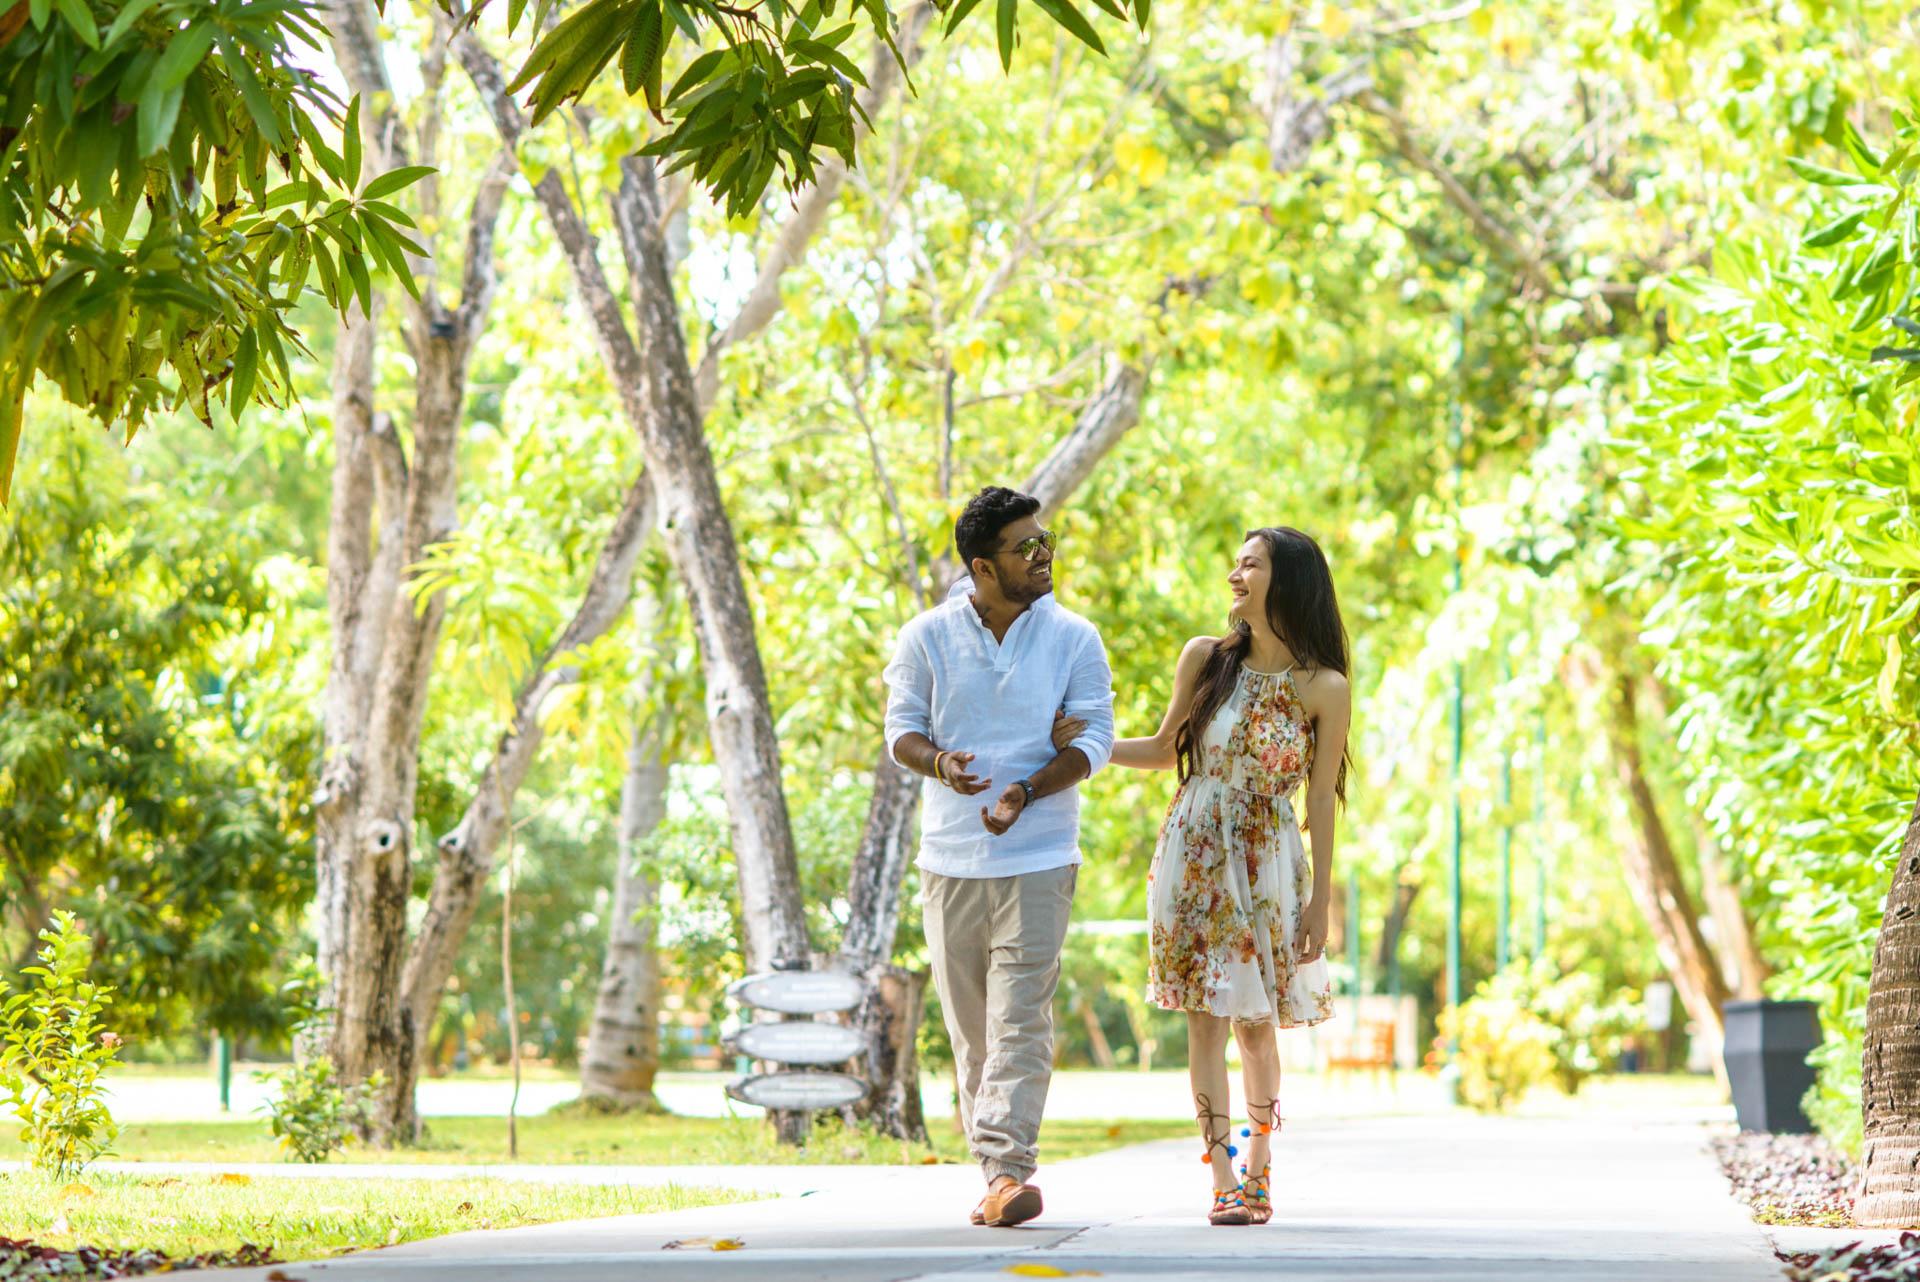 Abhijit Meghna Romantic Vacation in Maldives 24